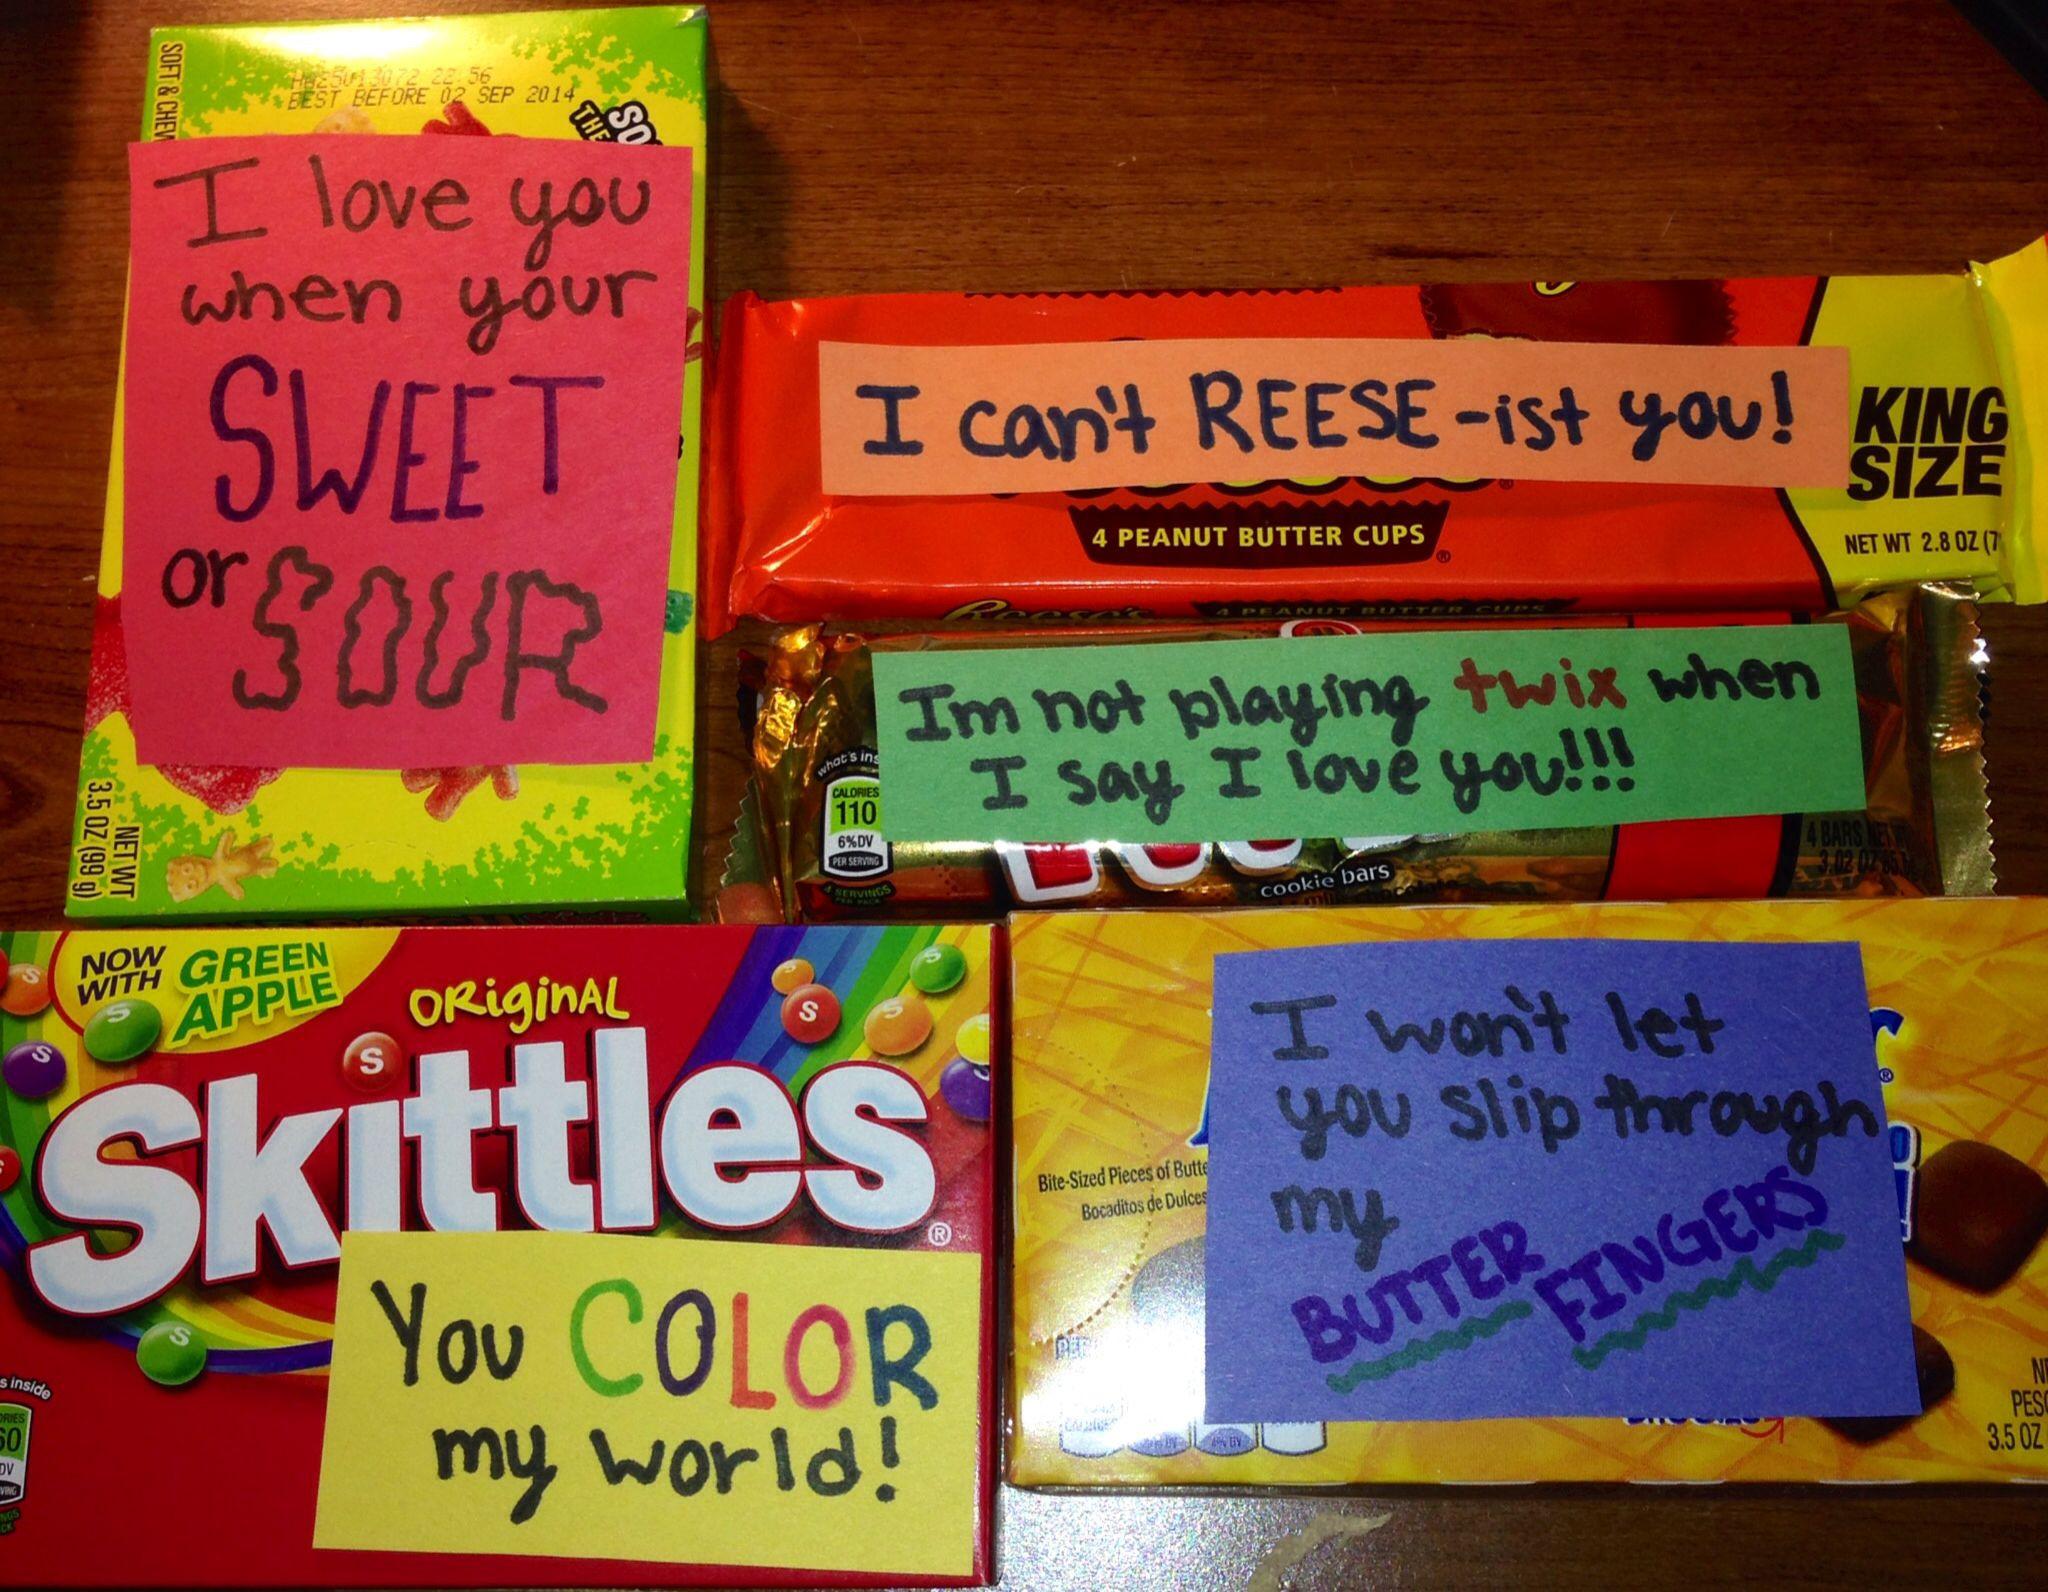 Cute Gift Ideas For Your Boyfriend  Best 25 Thoughtful ts for boyfriend ideas on Pinterest